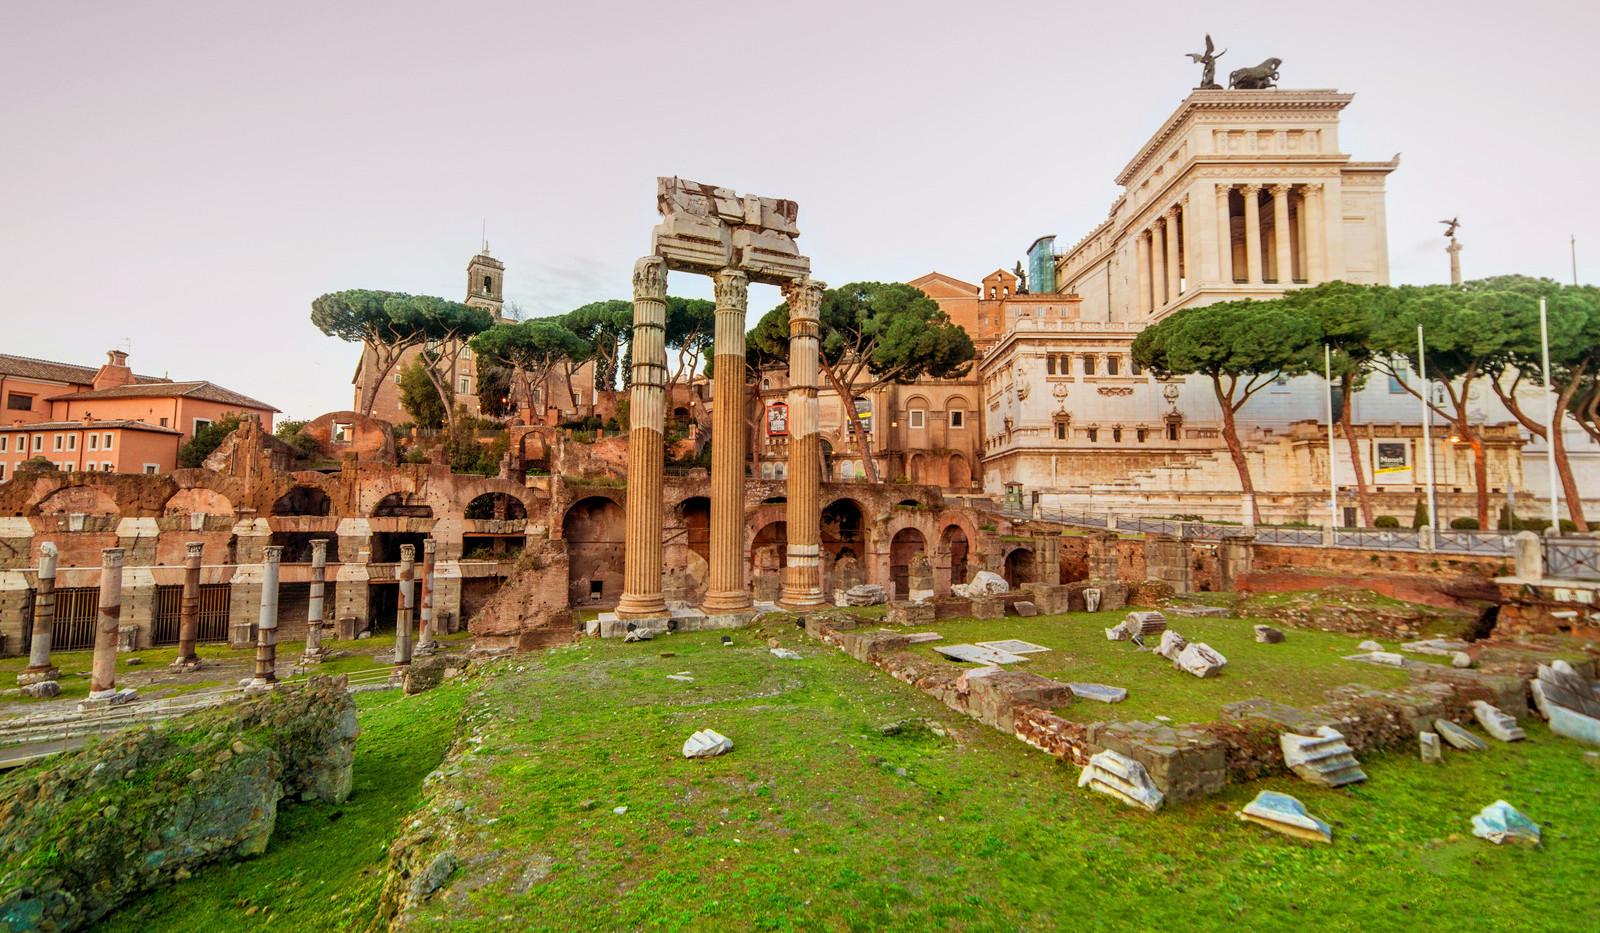 Canva - Roman Forum in Rome.jpg